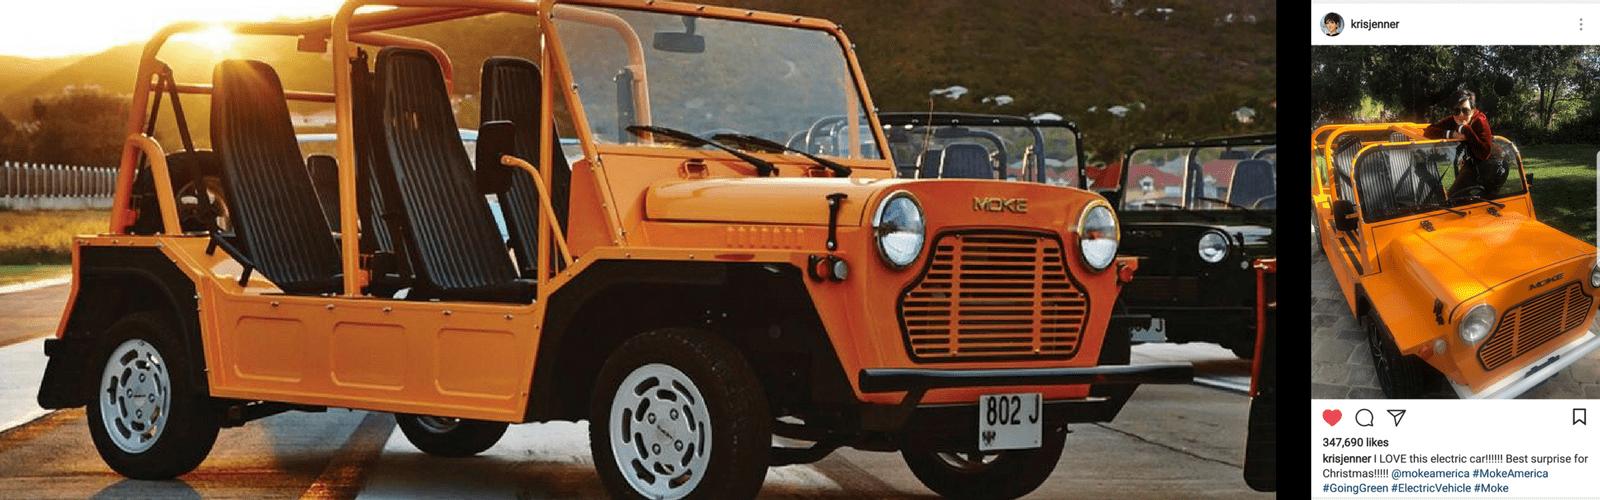 Kris Jenner Electric Jeep manufactured in Sarasota, Florida